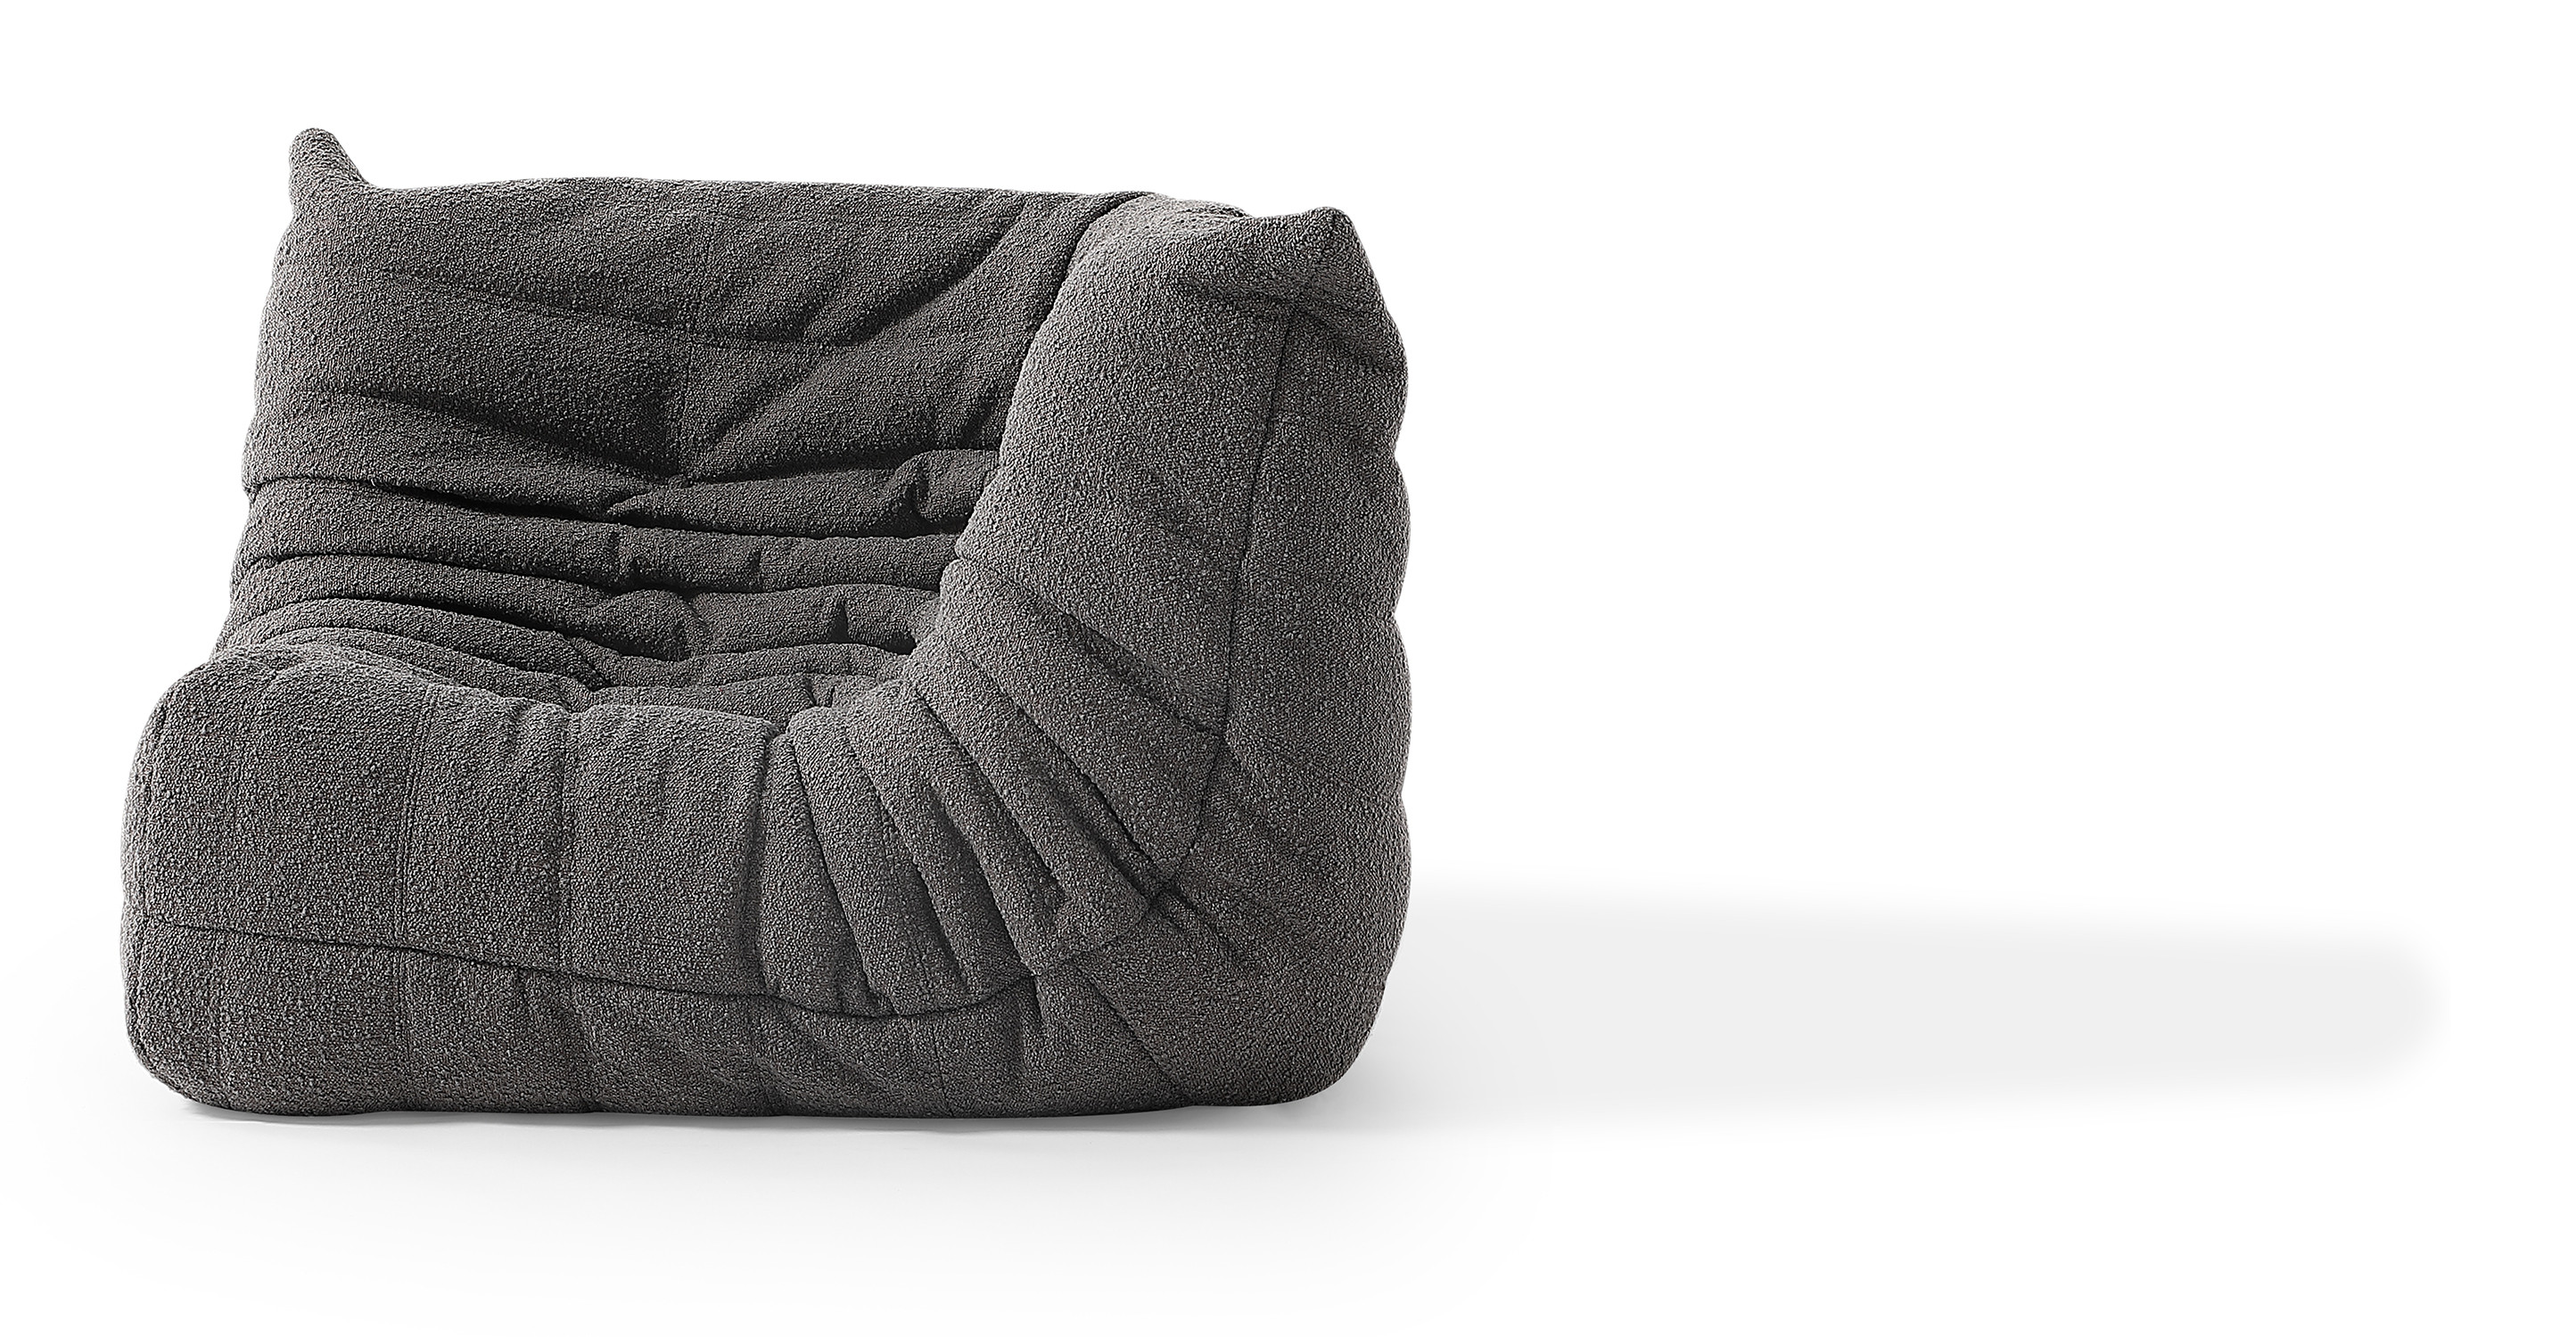 "Louvre 40"" Fabric Corner Chair, Gris Boucle"